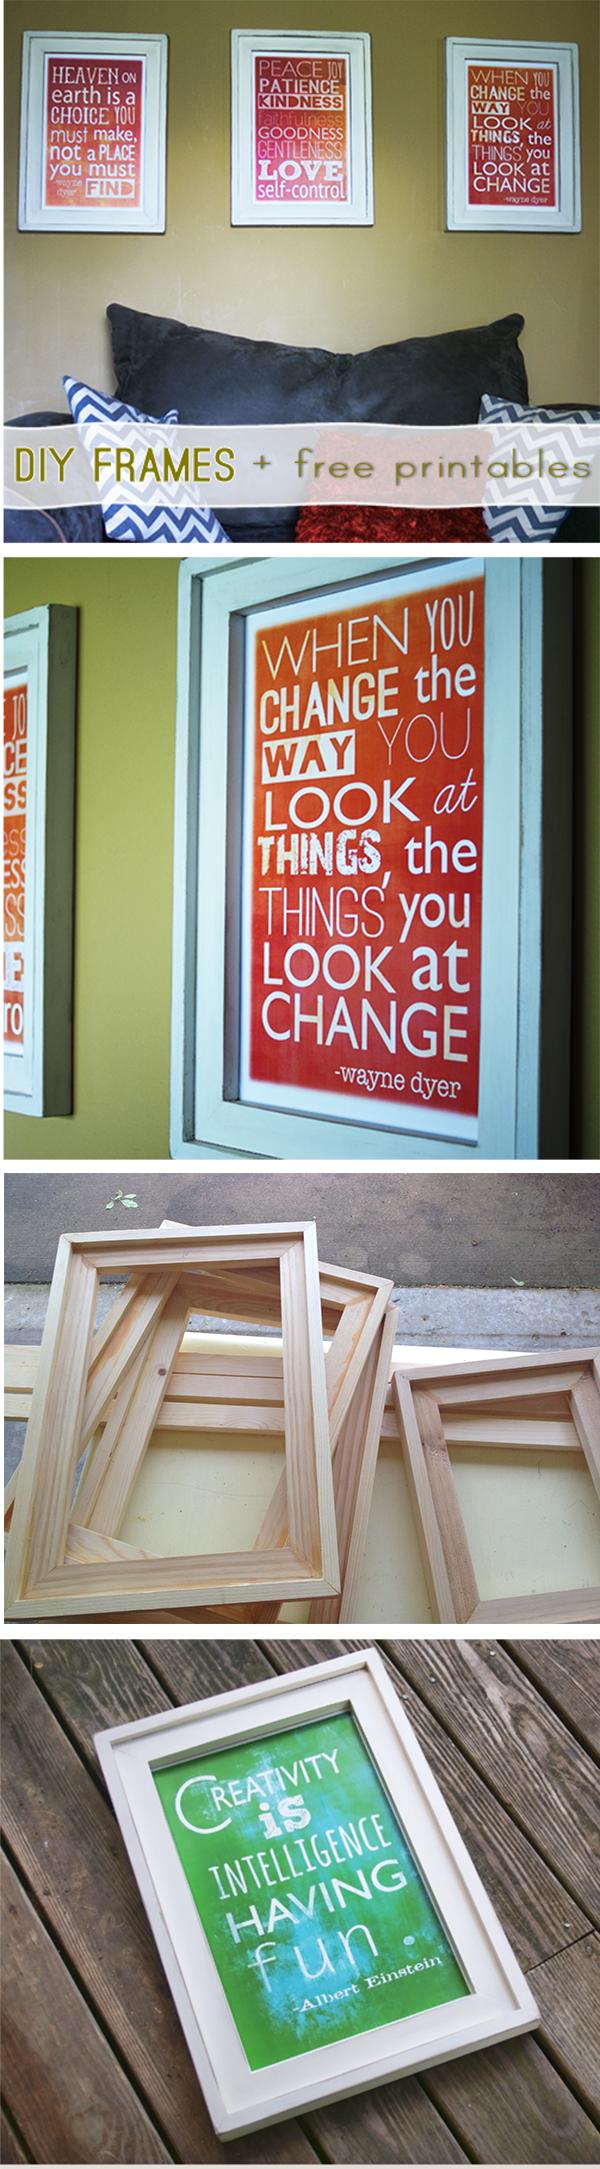 DIY Barnwood Frames from Ana White Plan + free inspirational ...